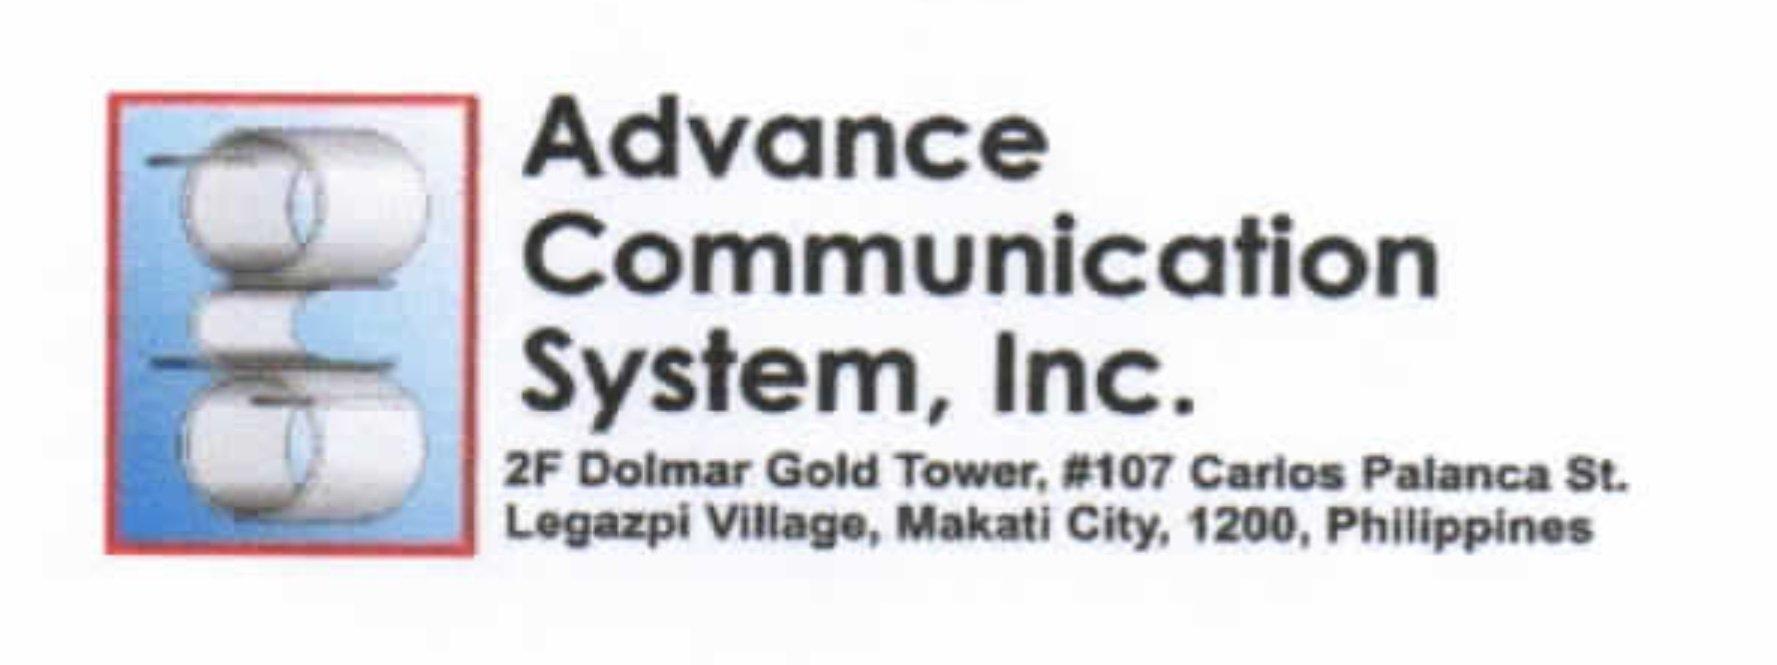 AHD Advance Communication System Inc.